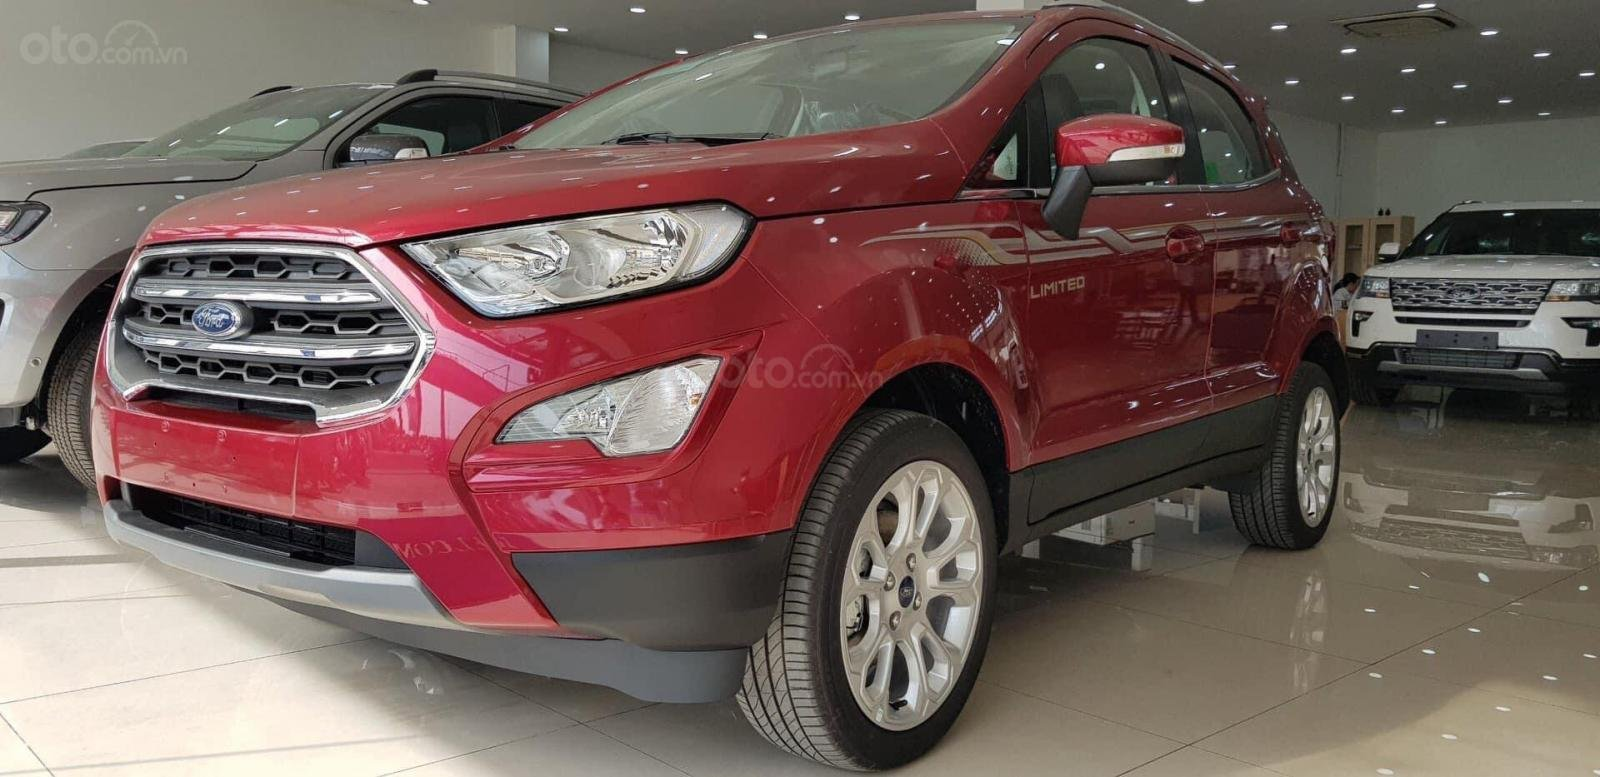 Ford Ecosport 1.0 Titanium đủ màu, giao ngay (4)